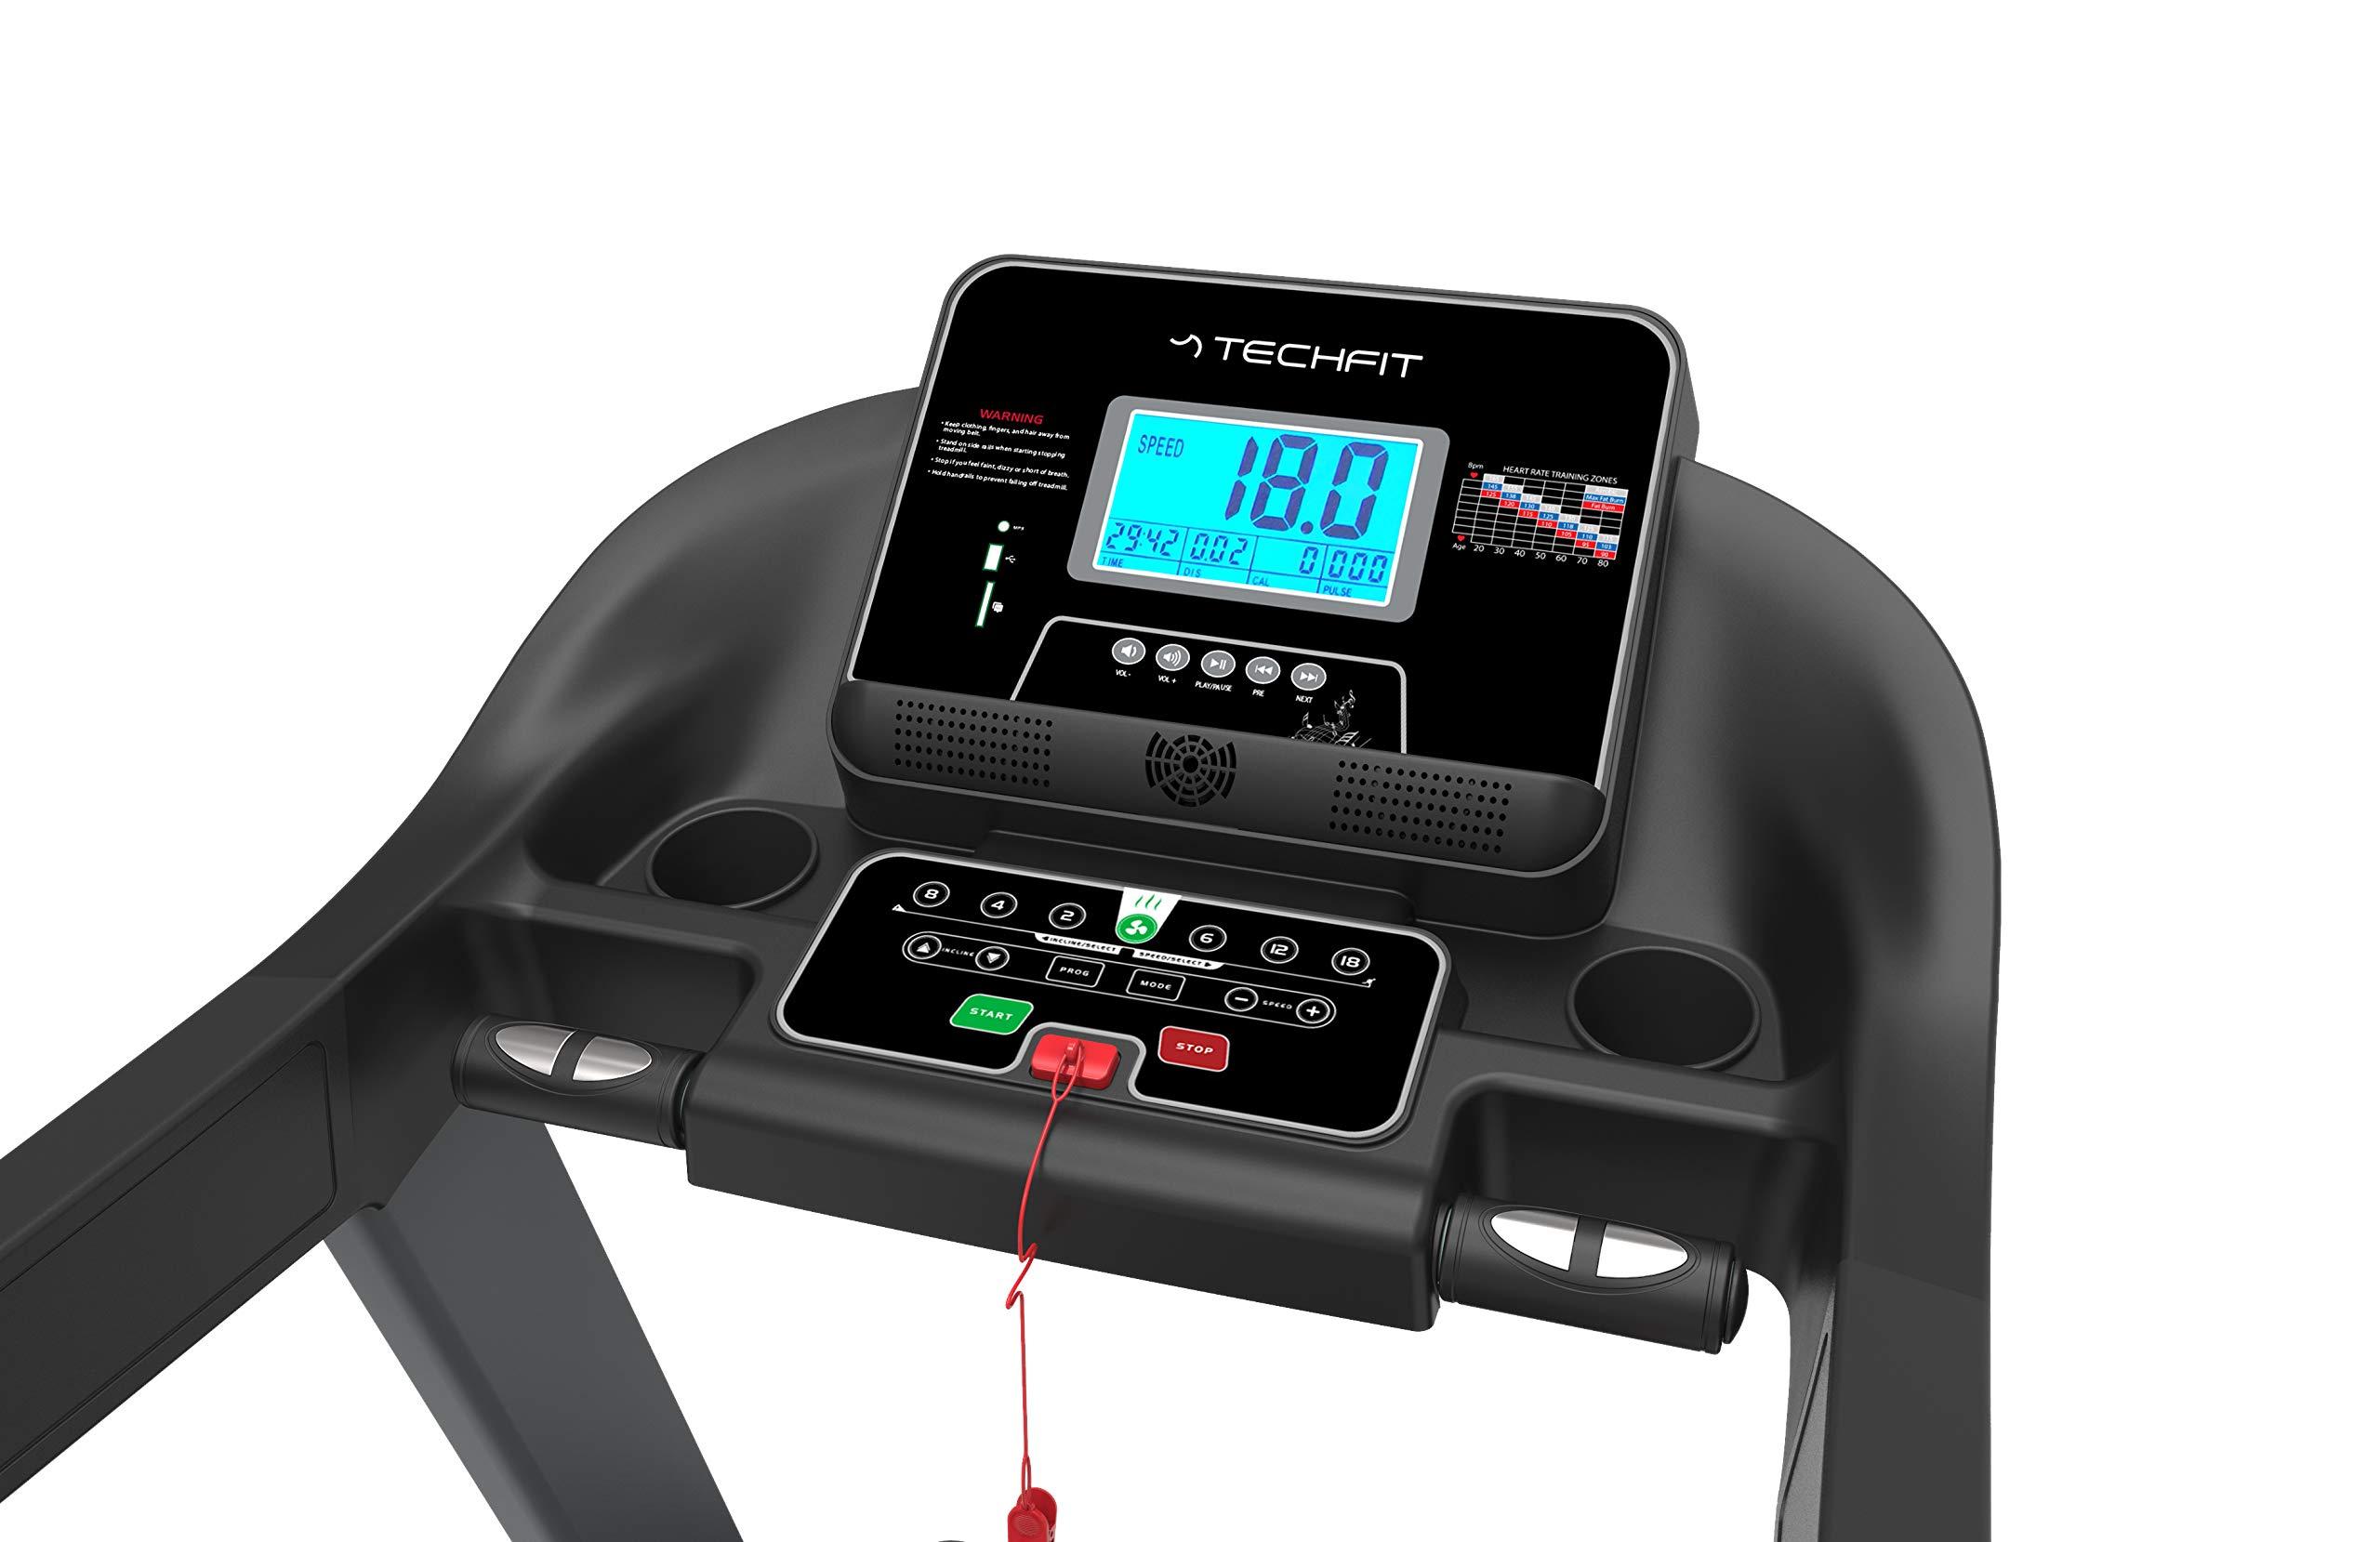 TechFit MT200 Tapis Roulant Professionale, Autolubrificazione, 5.0 HP, Fitness App, Bluetooth, Sistema di Piegatura… 5 spesavip